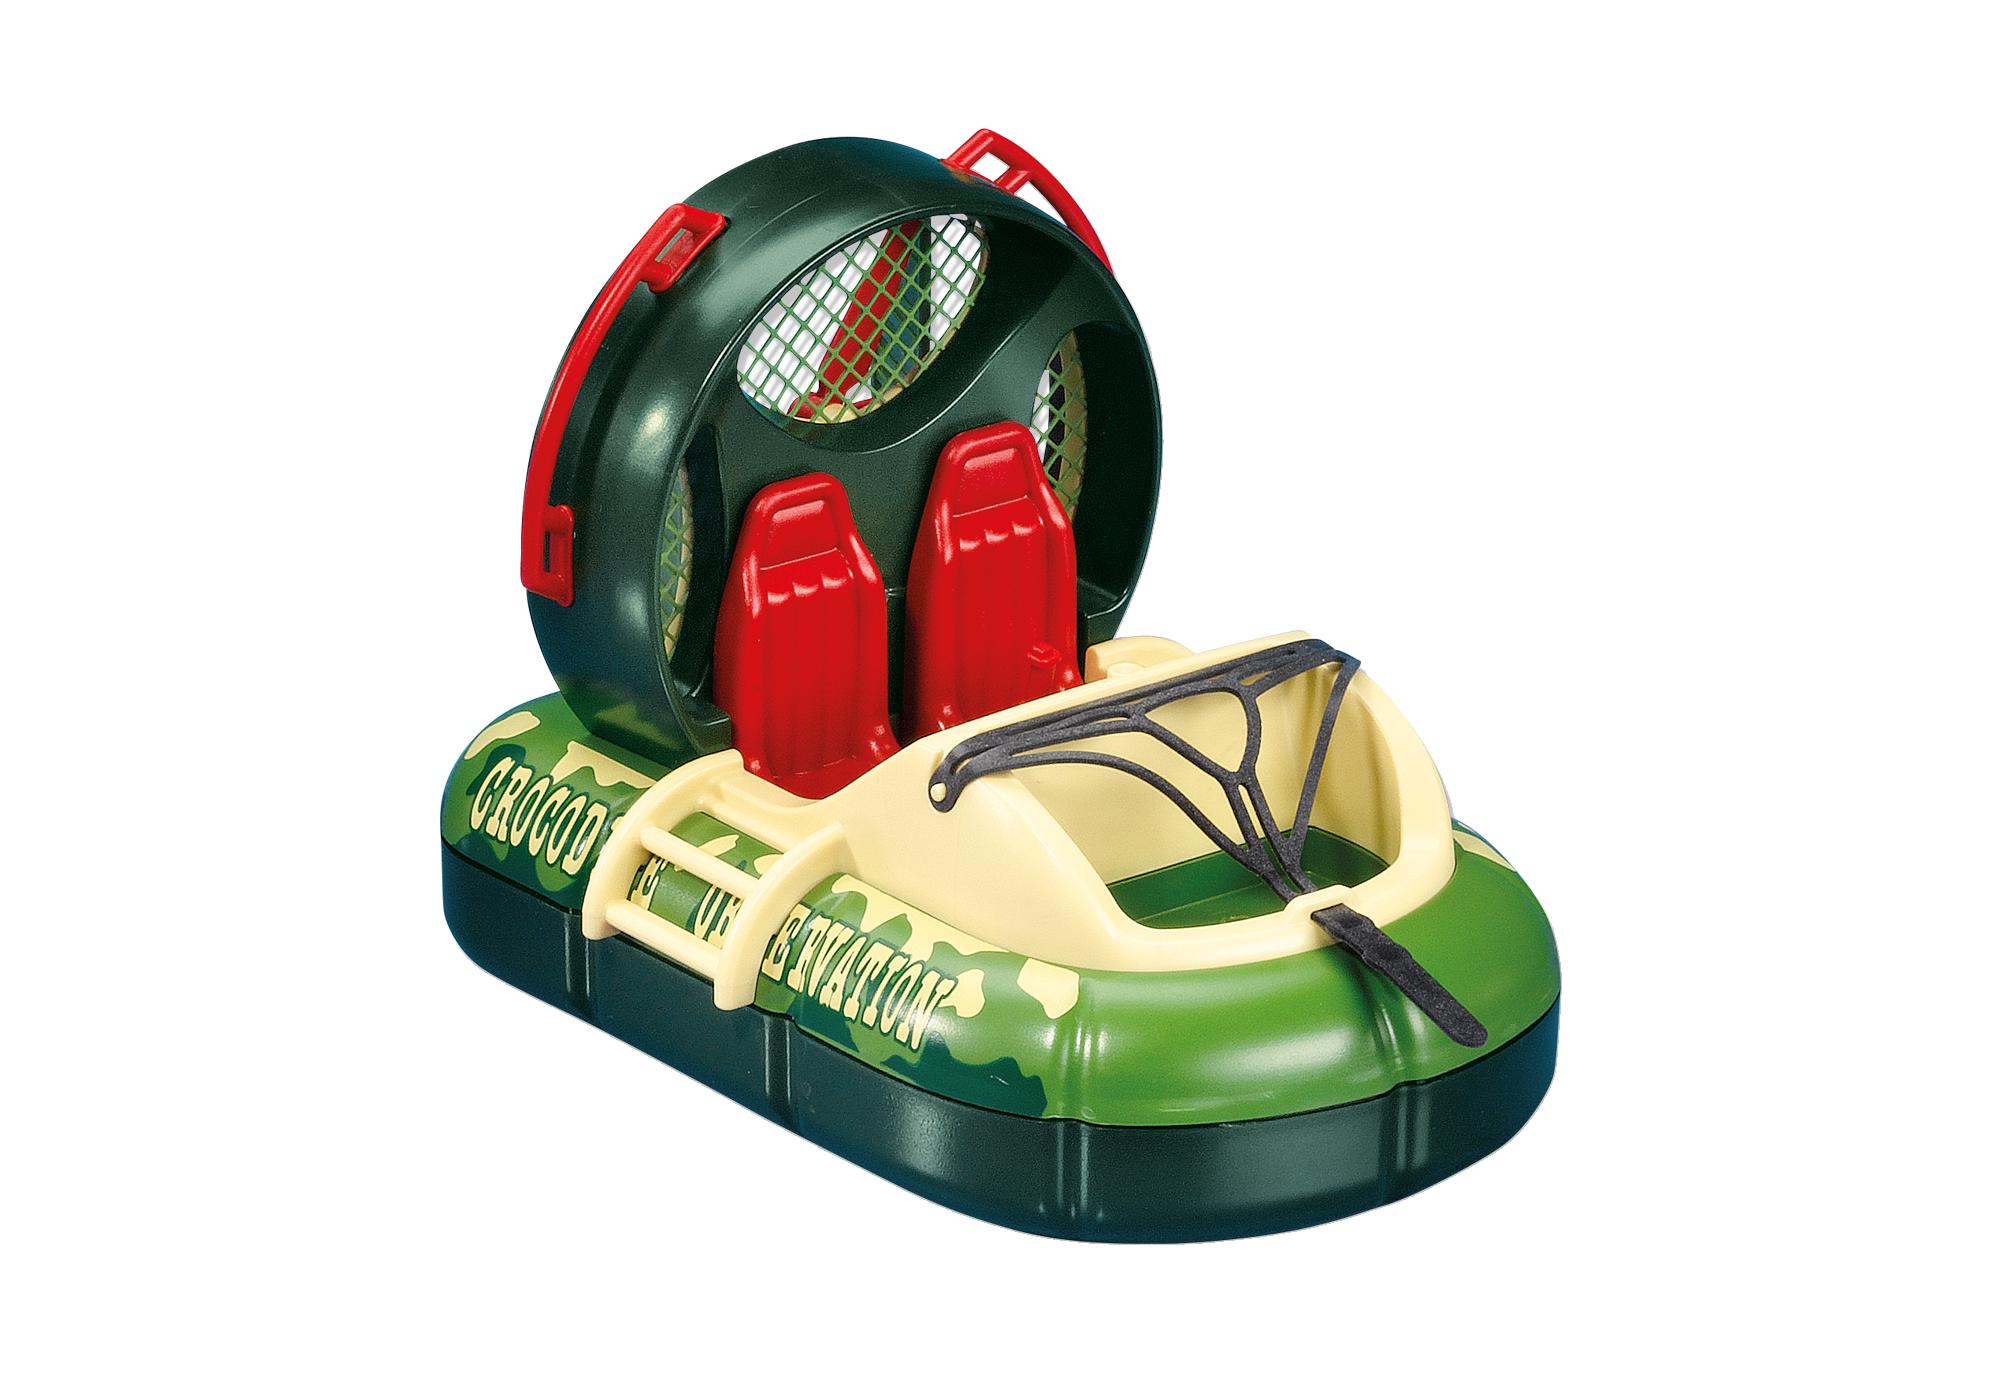 http://media.playmobil.com/i/playmobil/7491_product_detail/Hovercraft